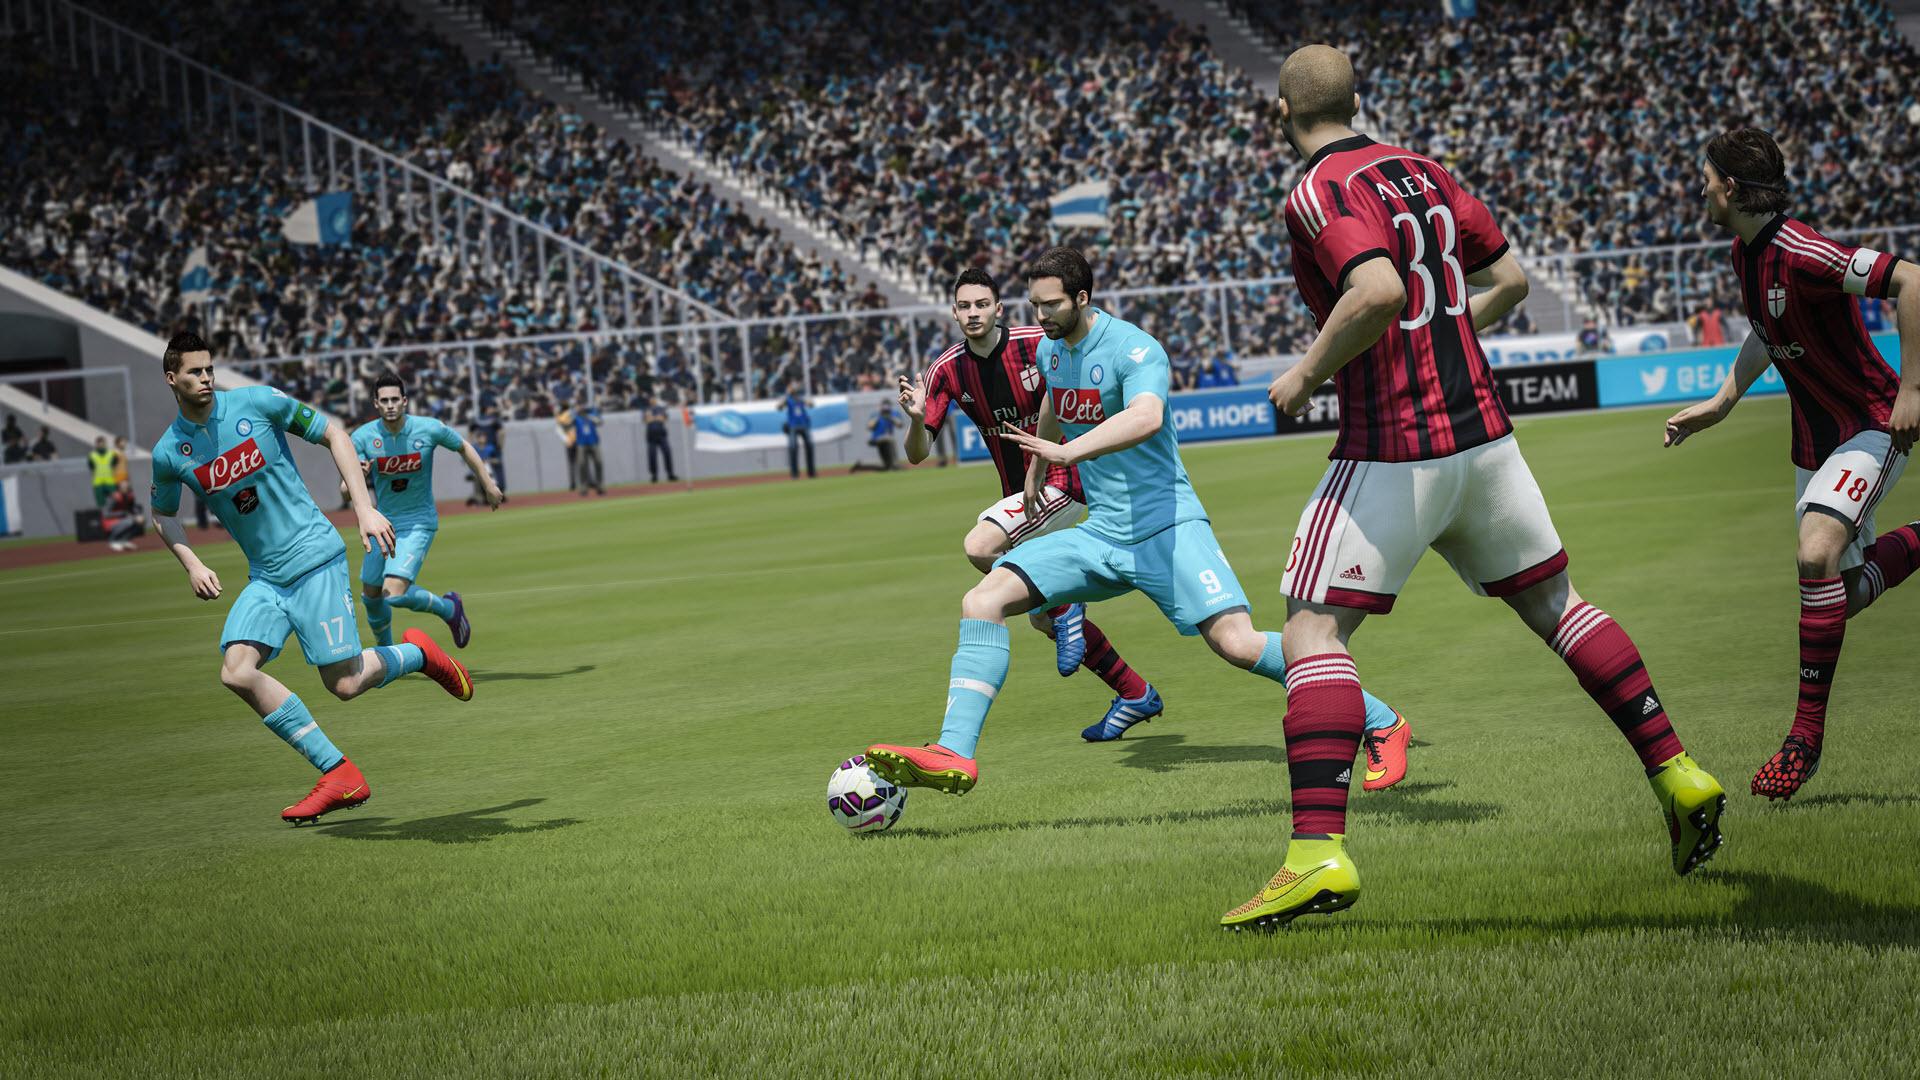 FIFA15_XboxOne_PS4_Napoli_vs_ACMilan_Agility&Control